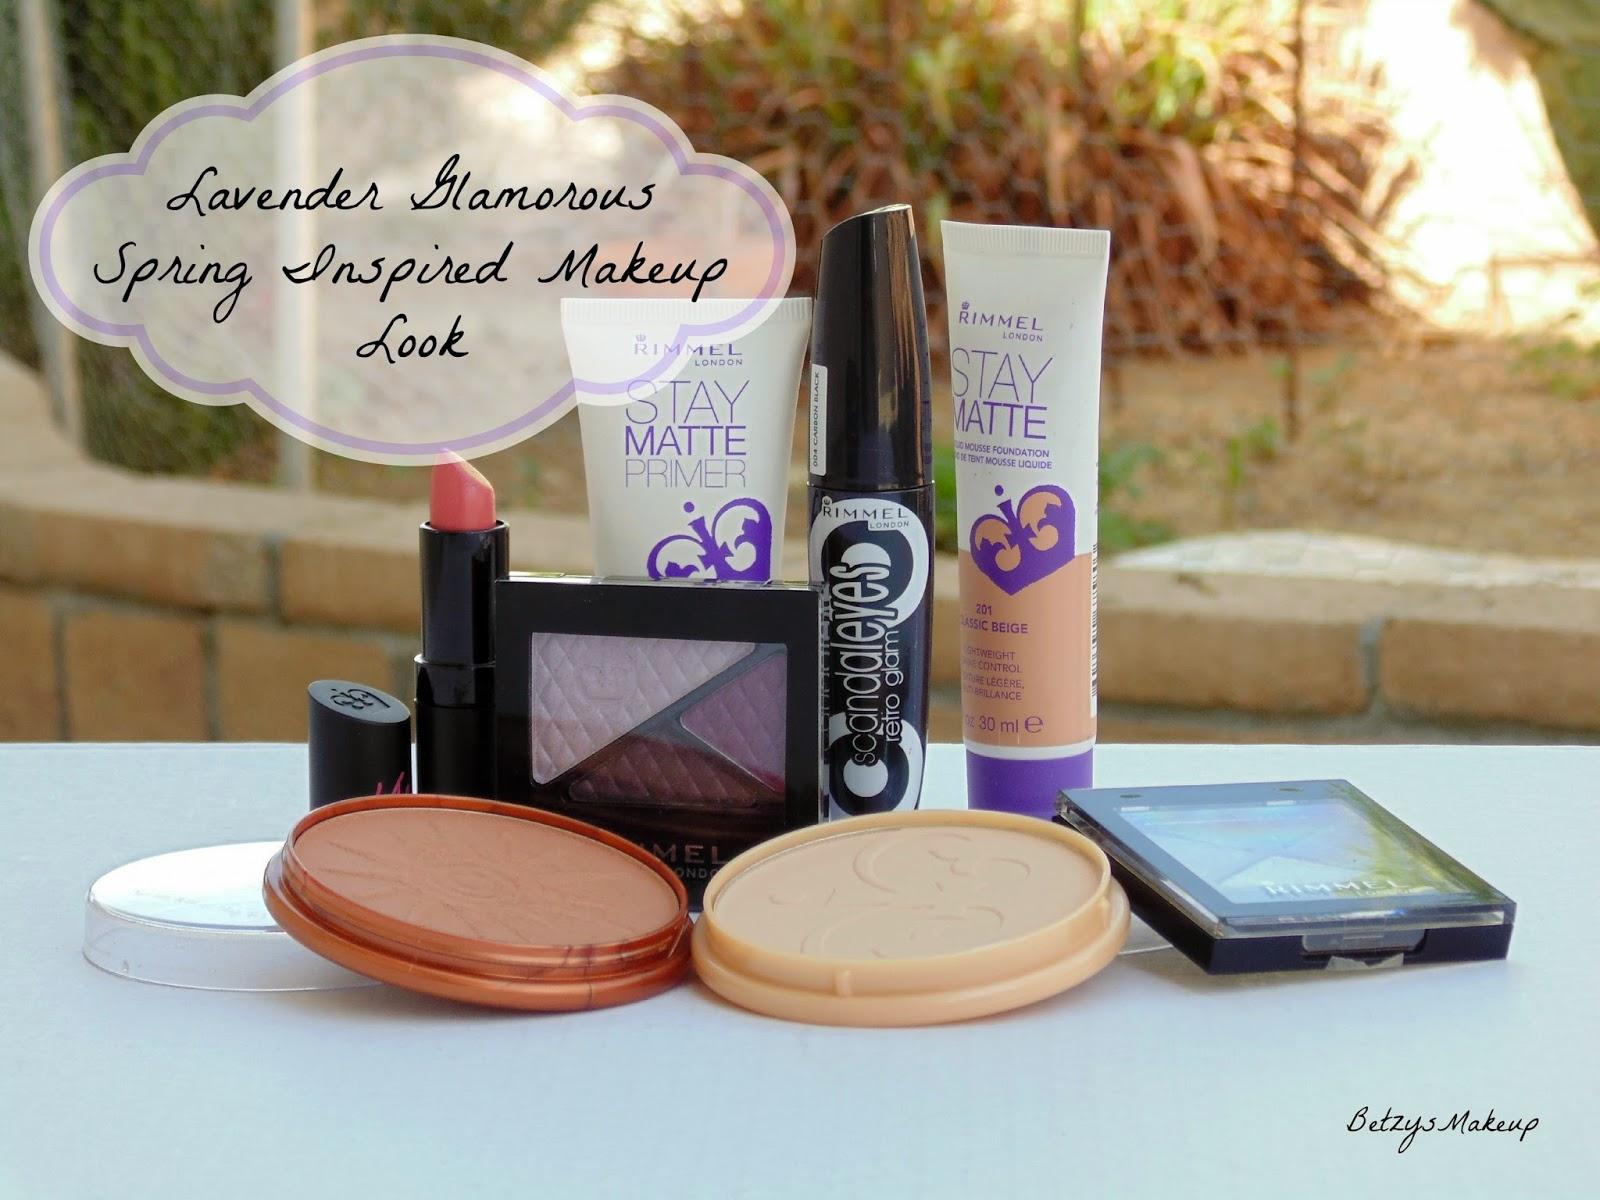 Lavender-Glamorous-Spring-Inspired-Makeup